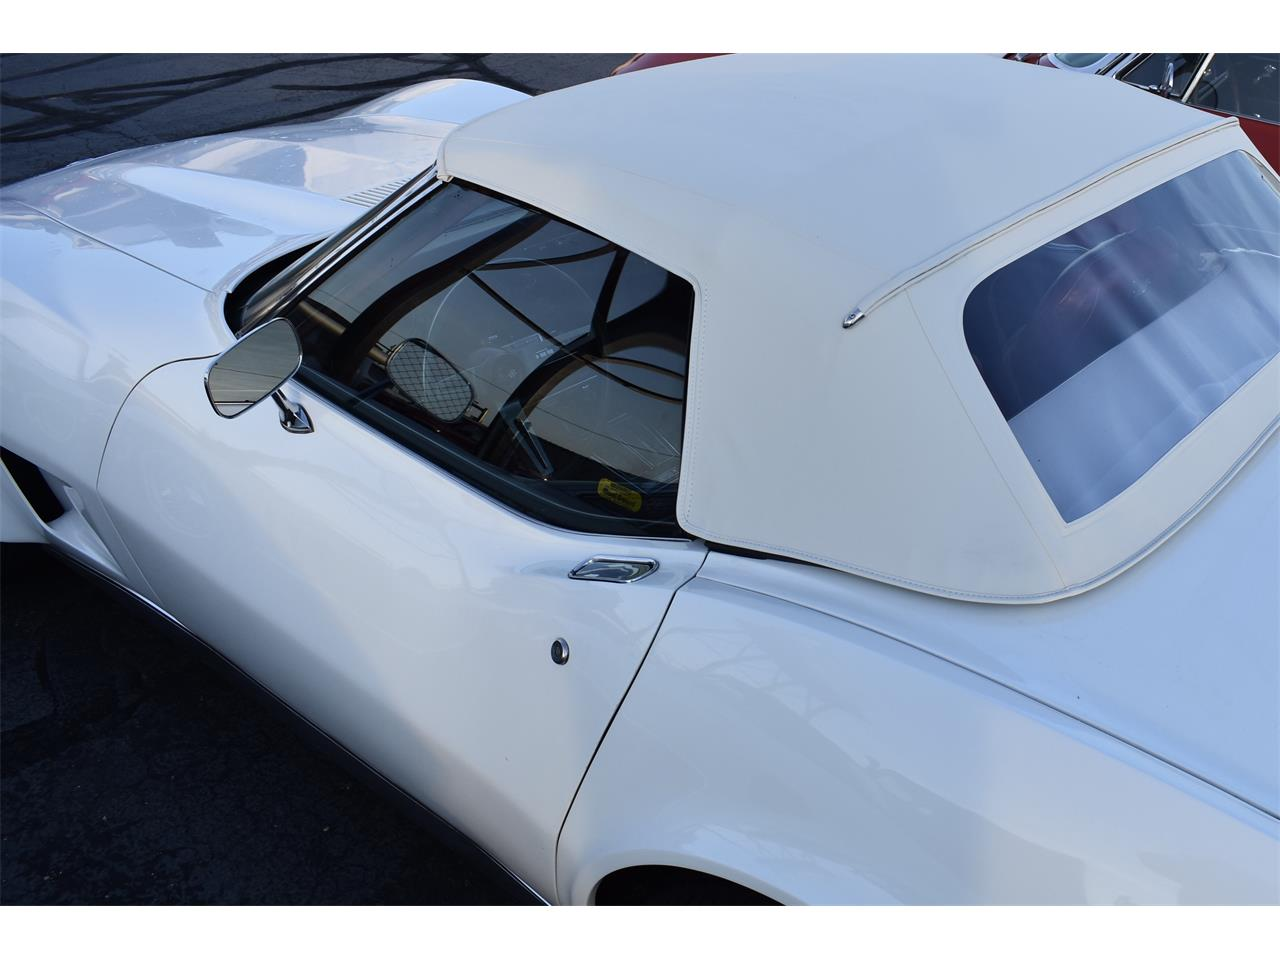 Large Picture of 1973 Chevrolet Corvette located in Phoenix Arizona - $29,900.00 - Q67L